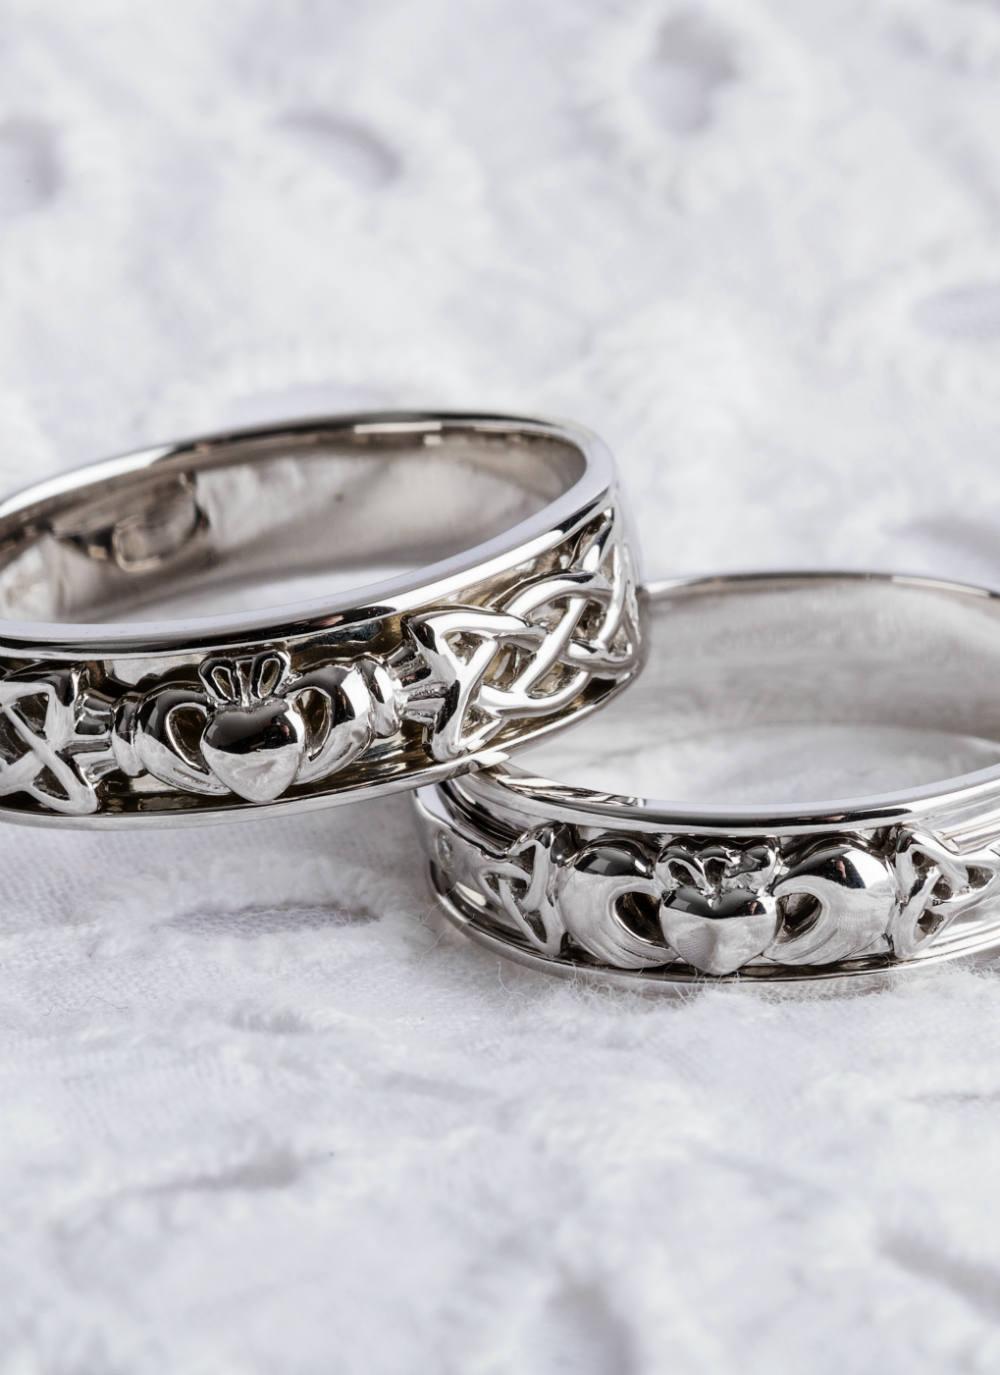 14k white gold claddagh wedding bands